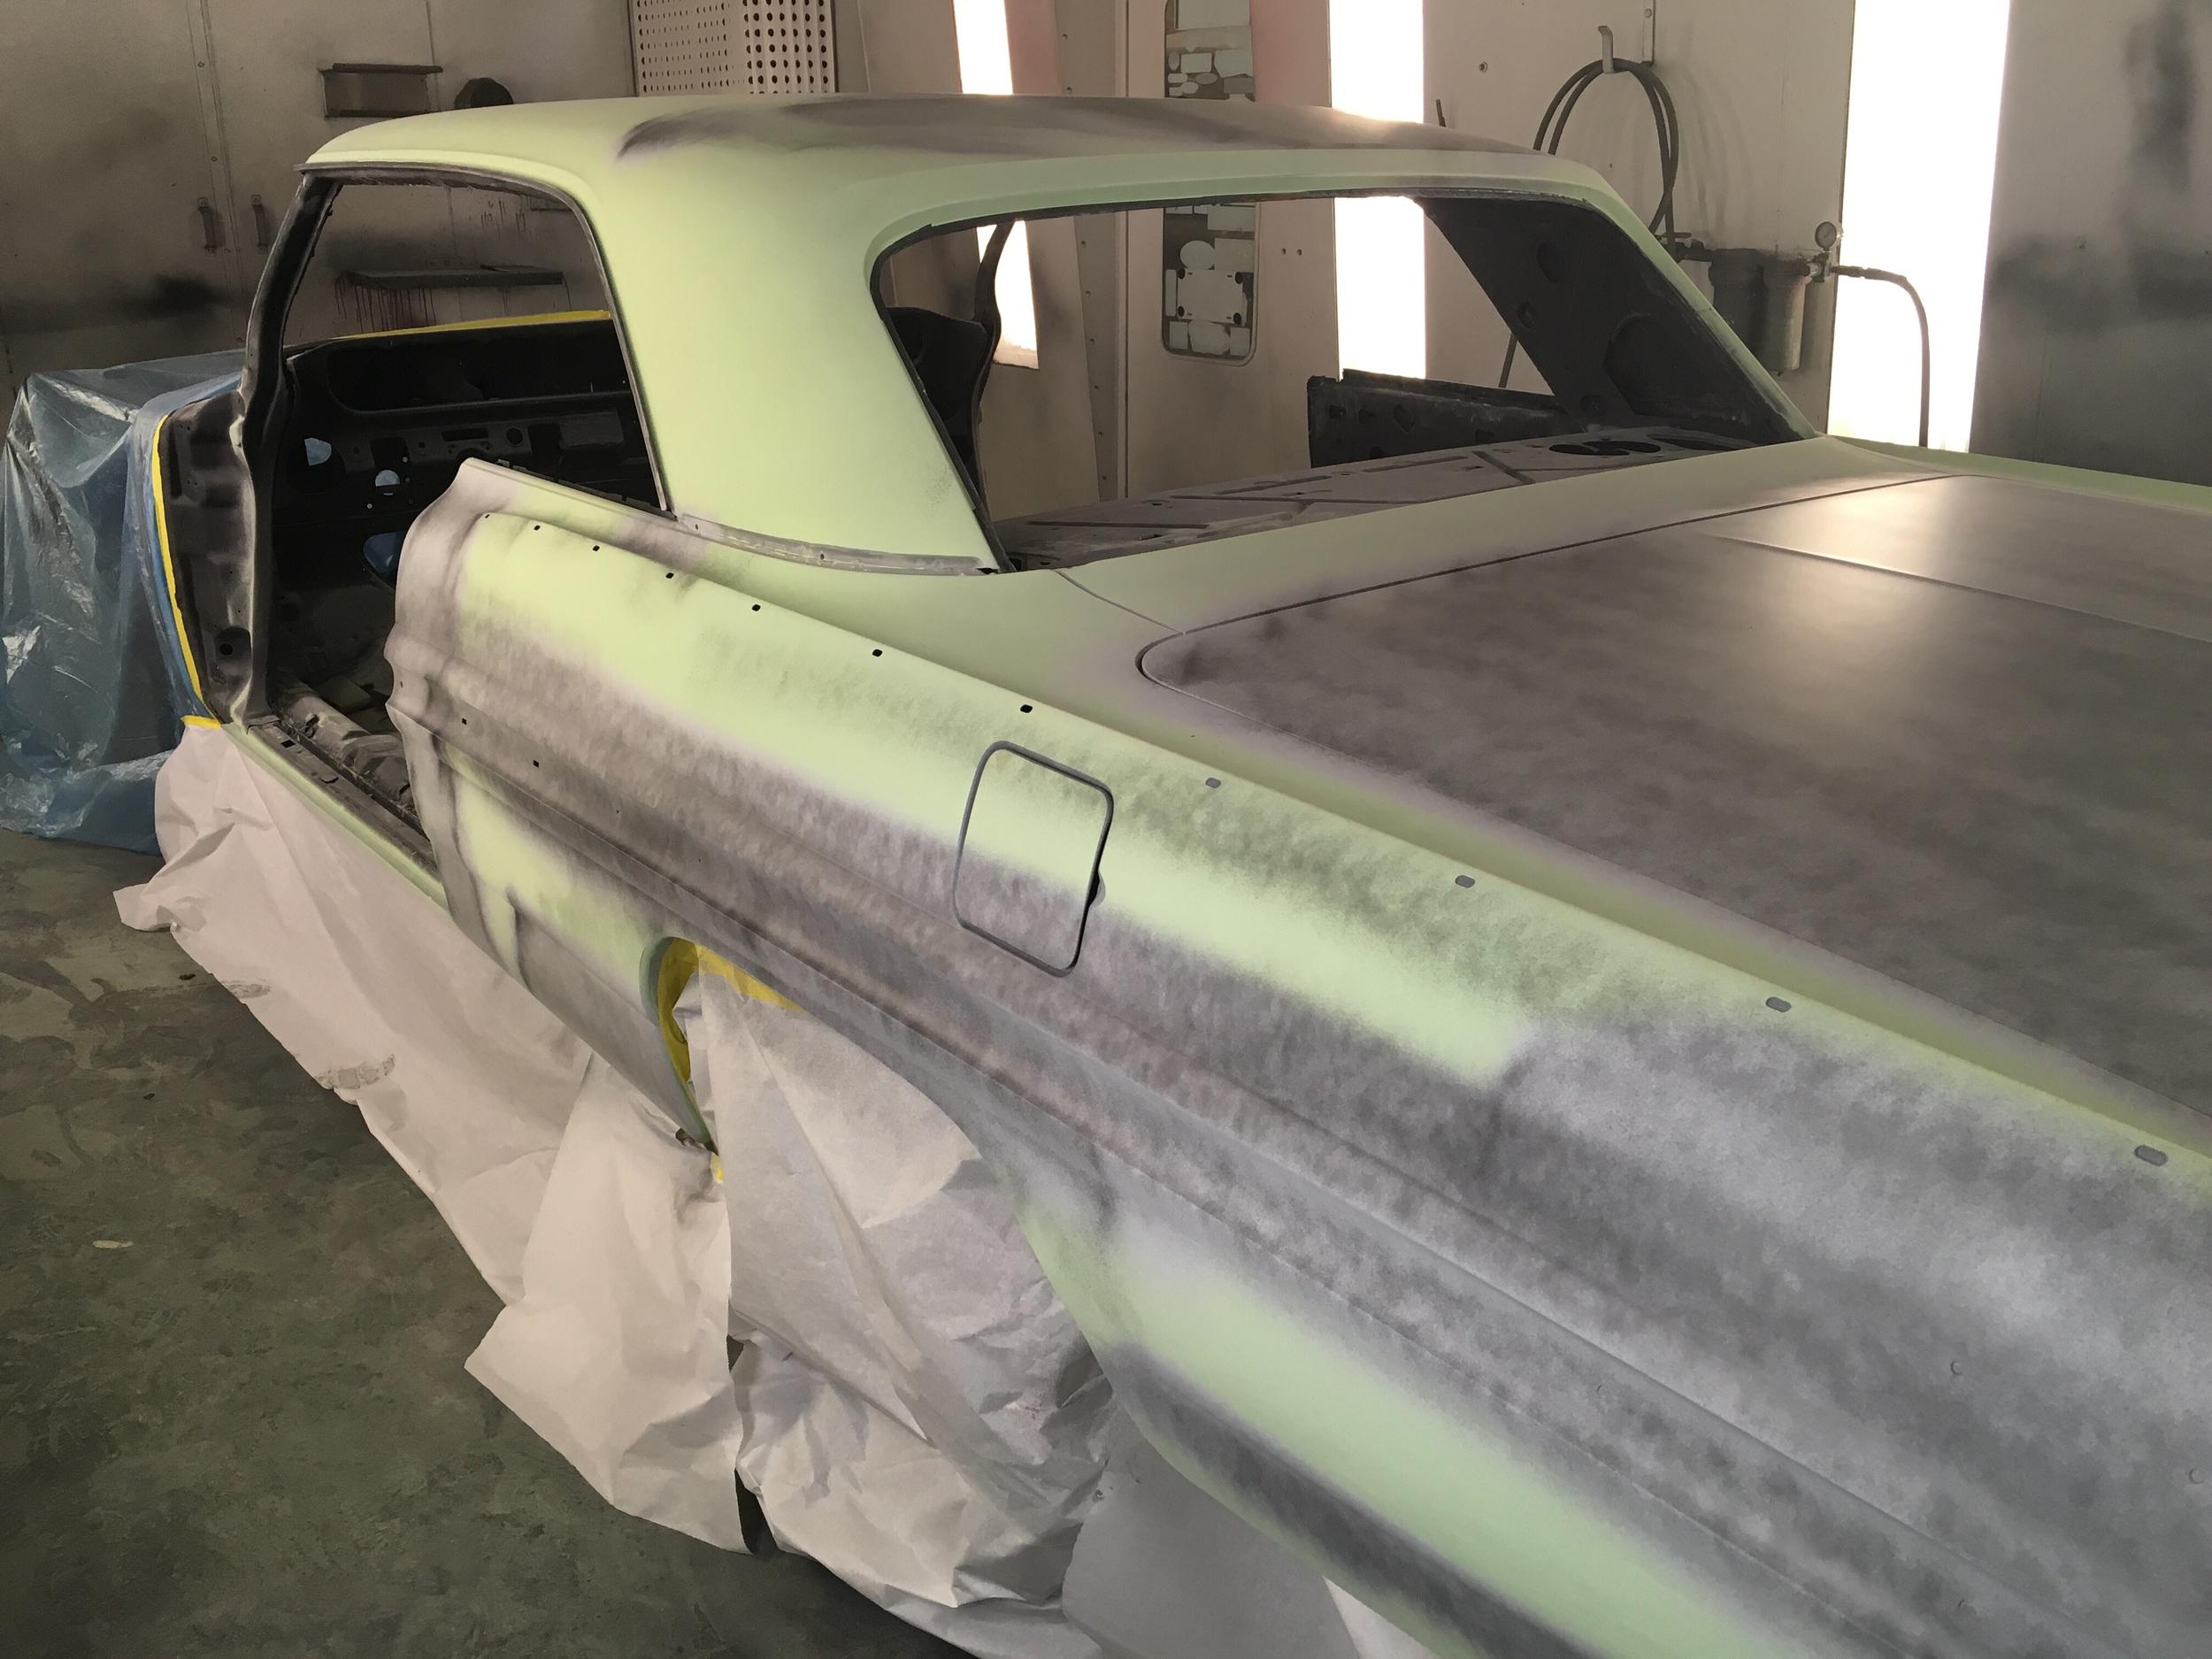 1962-Pontiac-Bonneville-minneapolis-hot-rod-custom-build-restoration-7.jpg